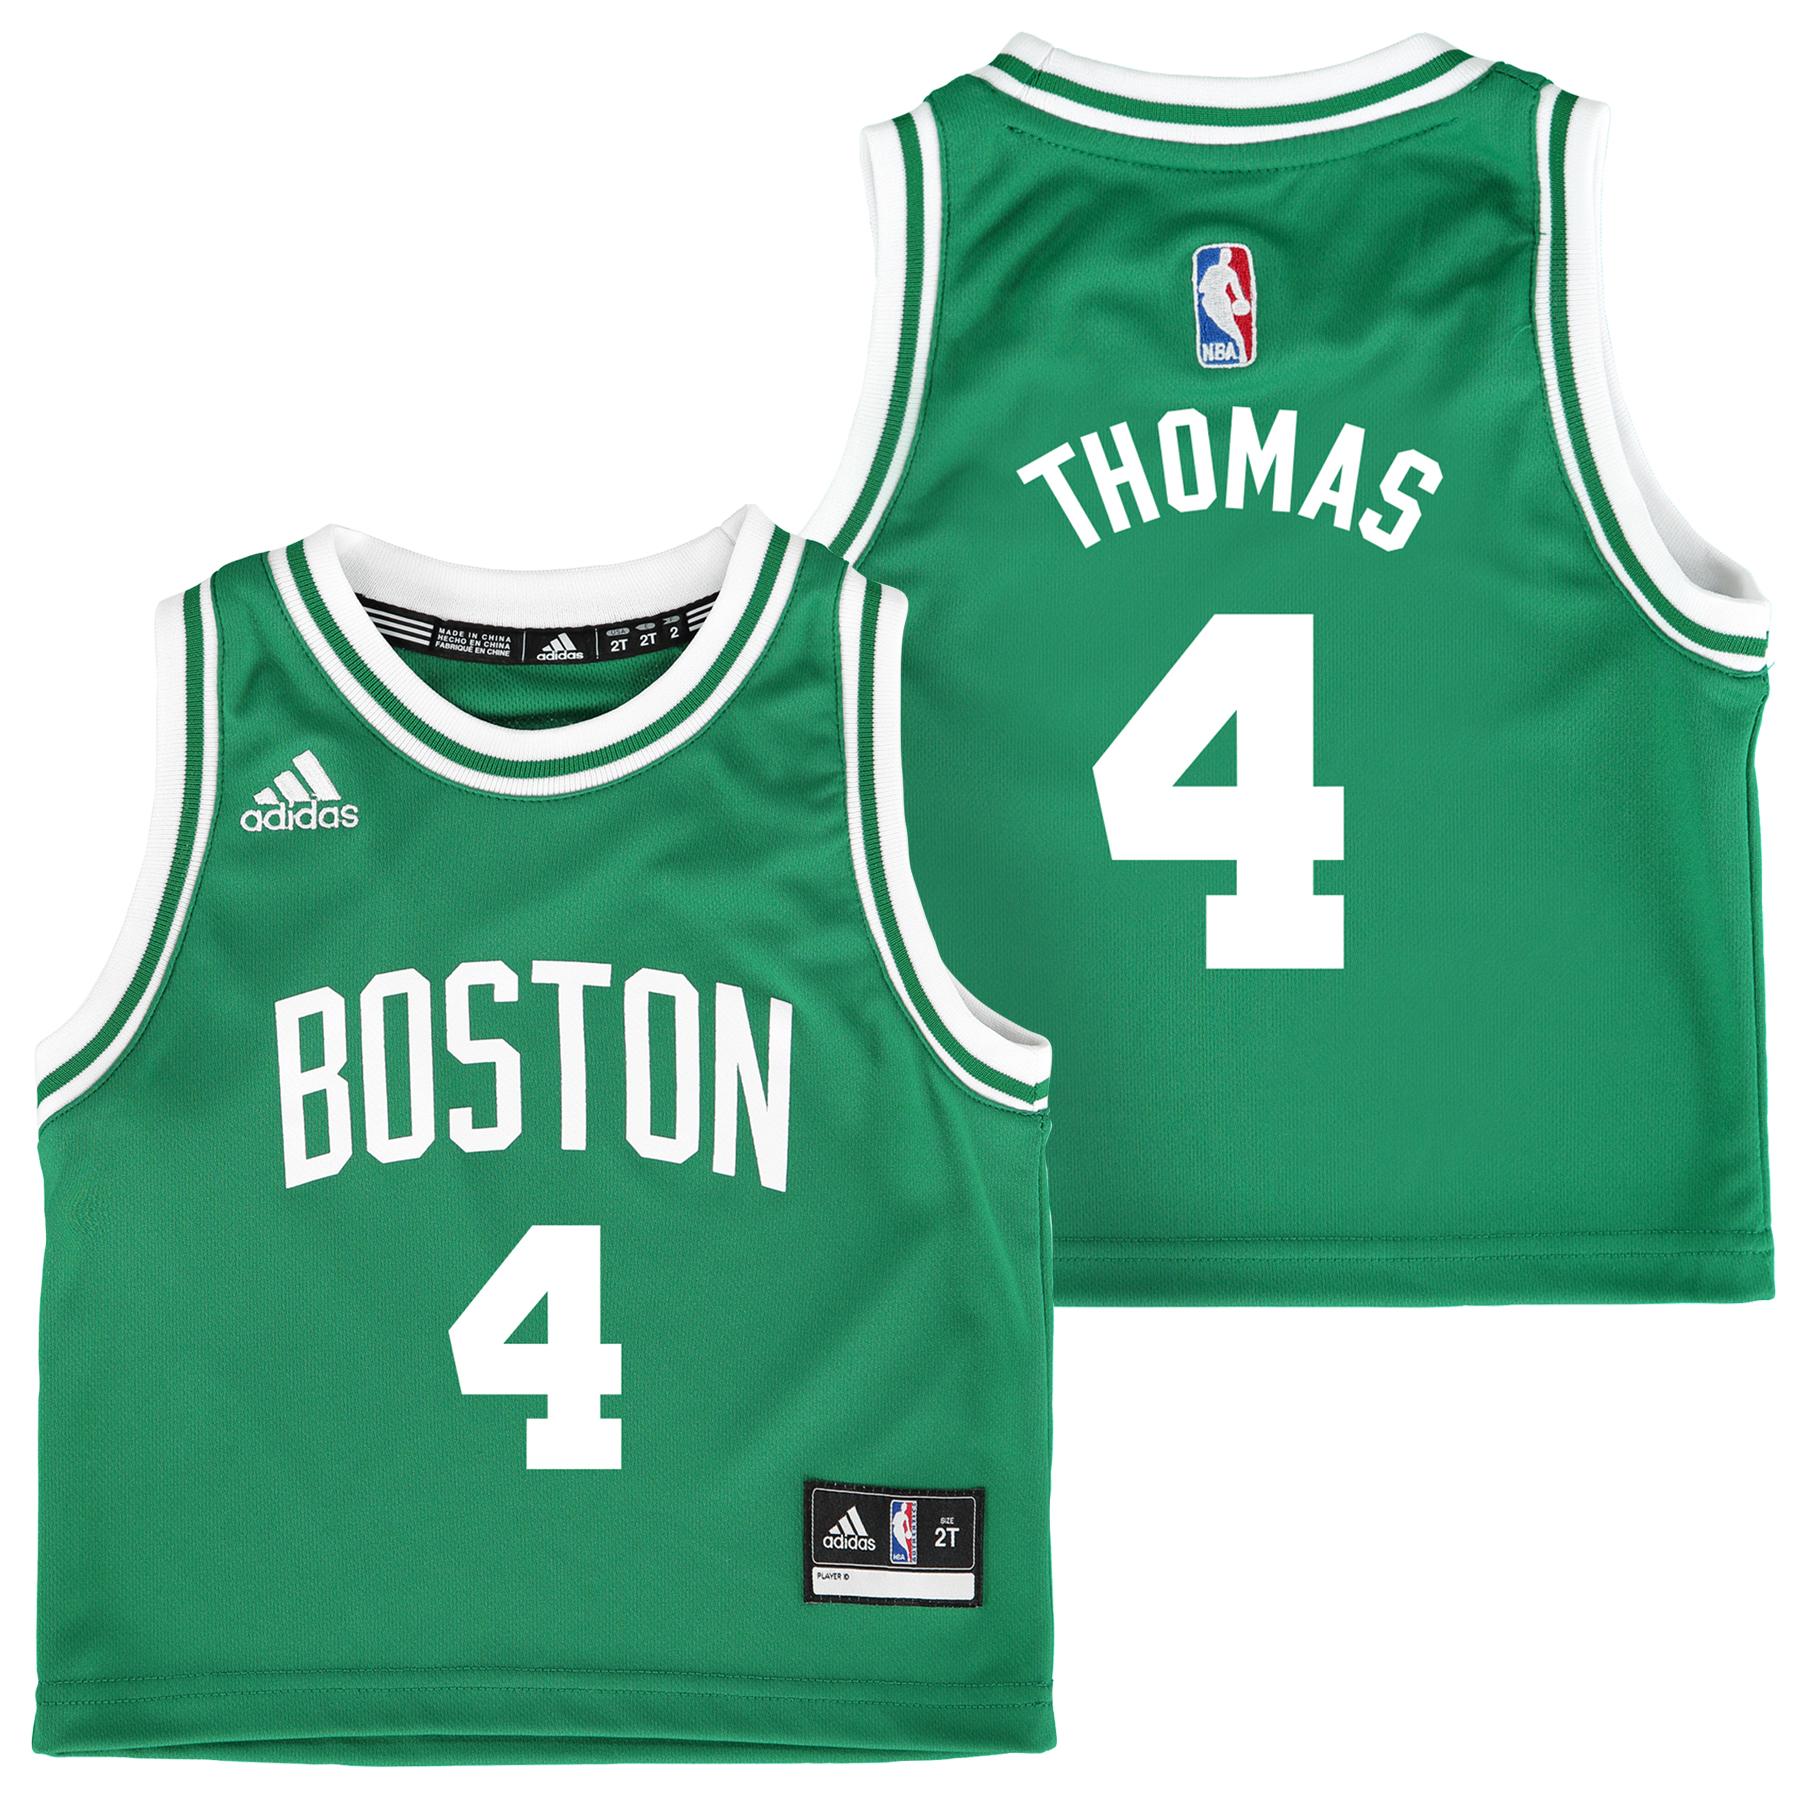 Boston Celtics Road Replica Jersey - Isaiah Thomas - Kids